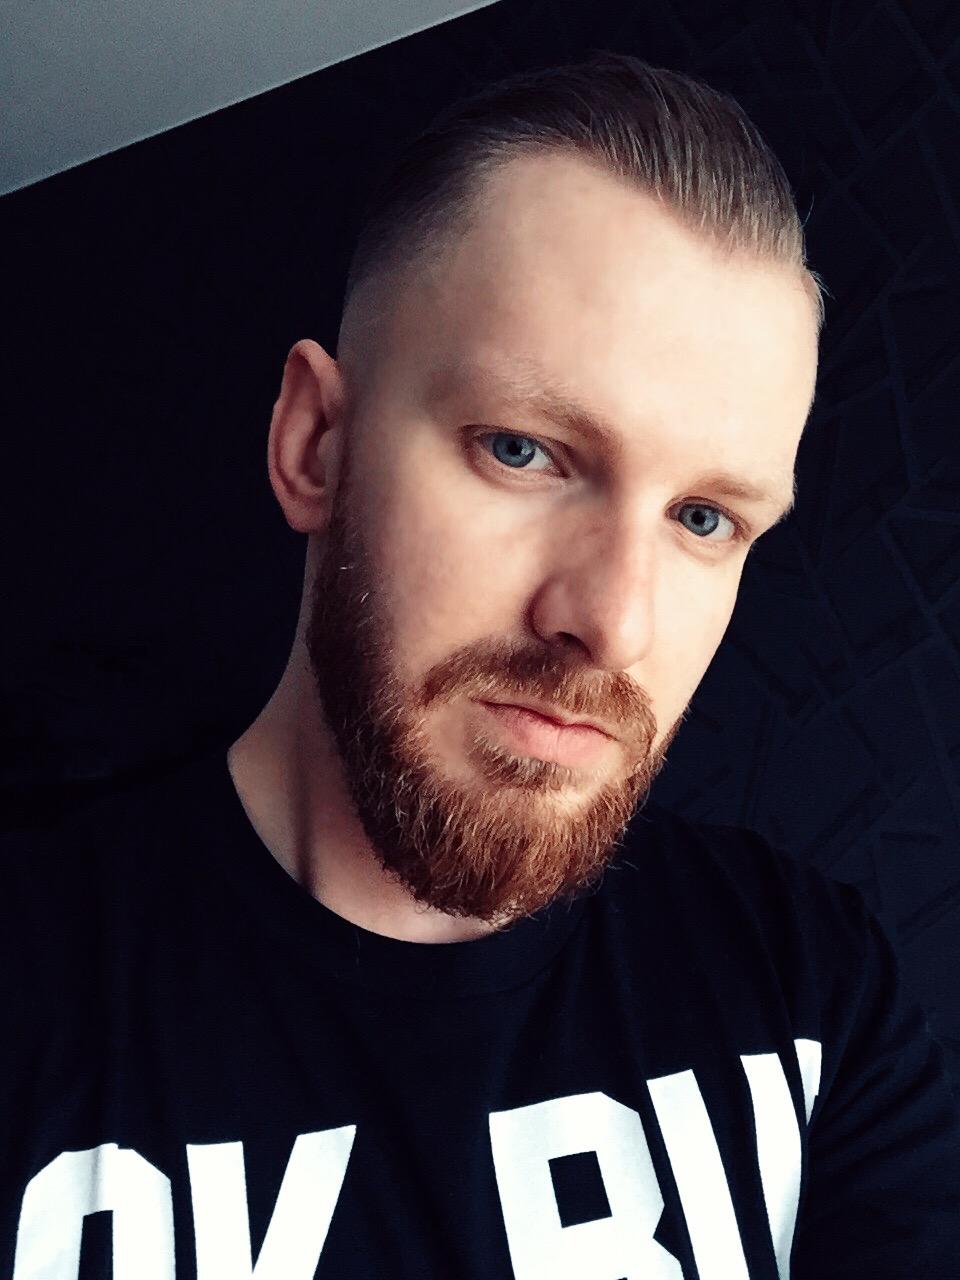 Piotr Limanowski